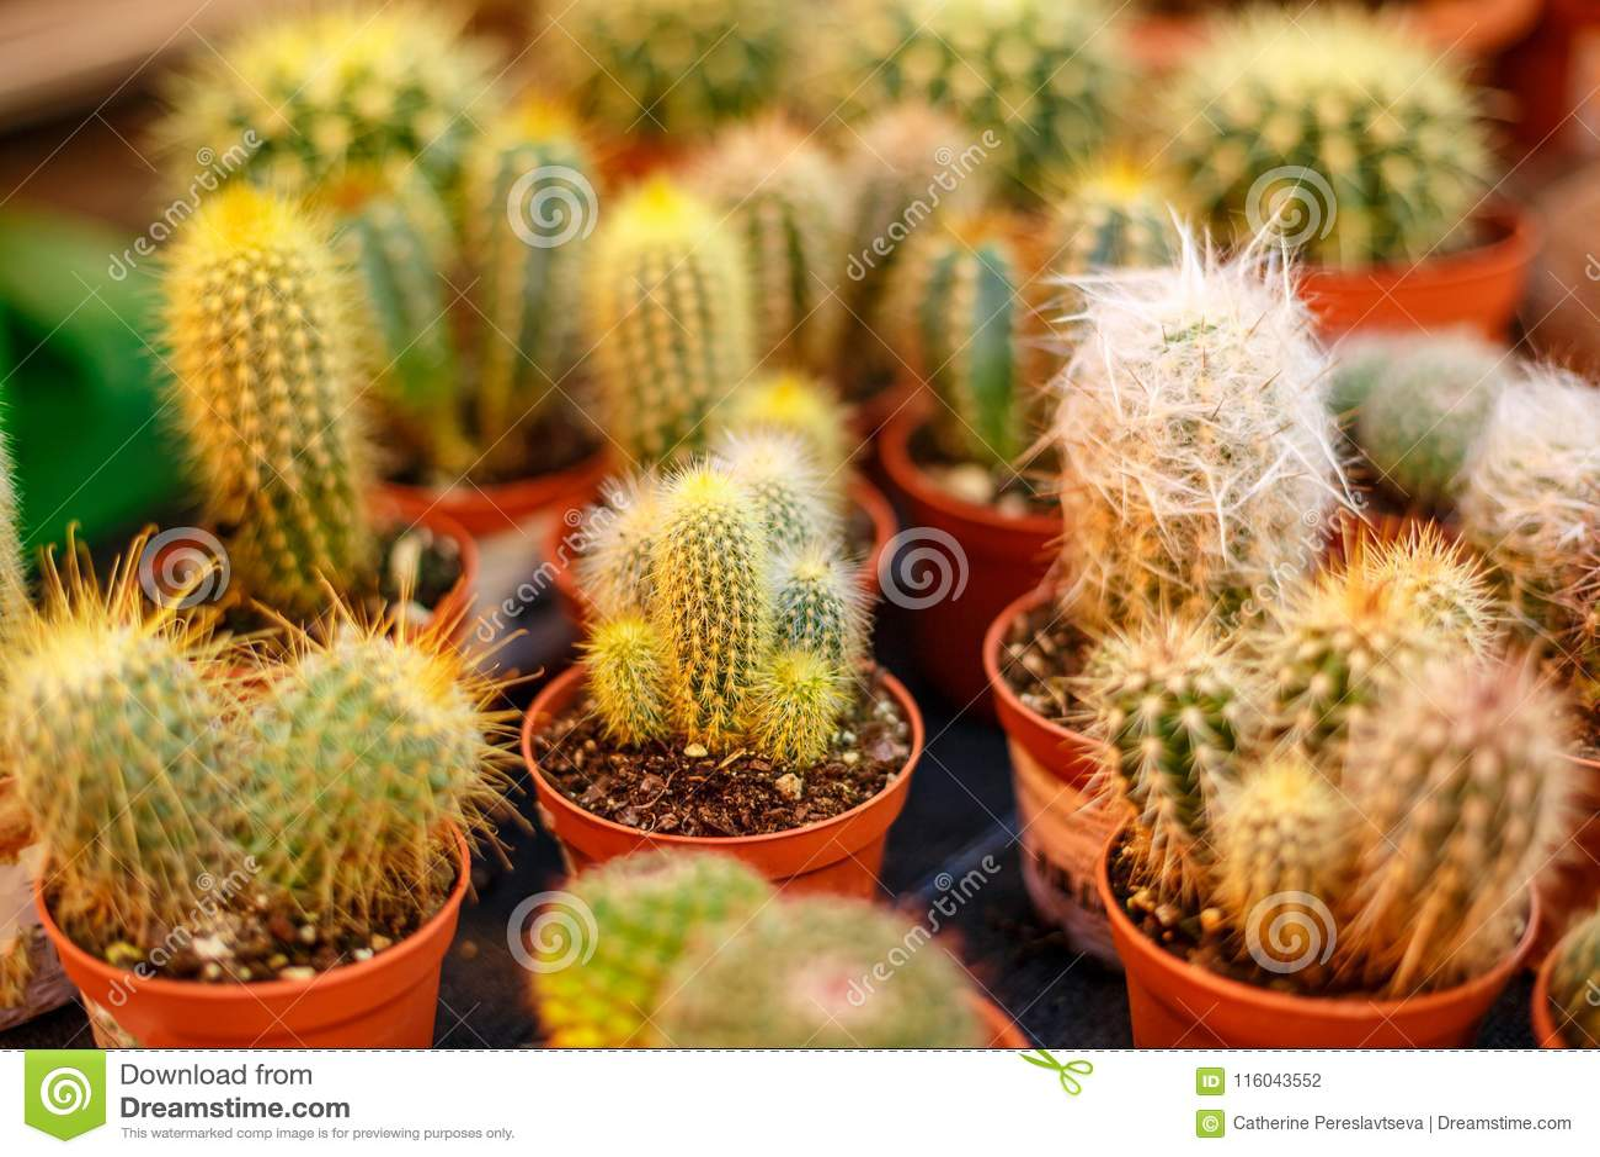 Pequeños cactus lanudos en potes